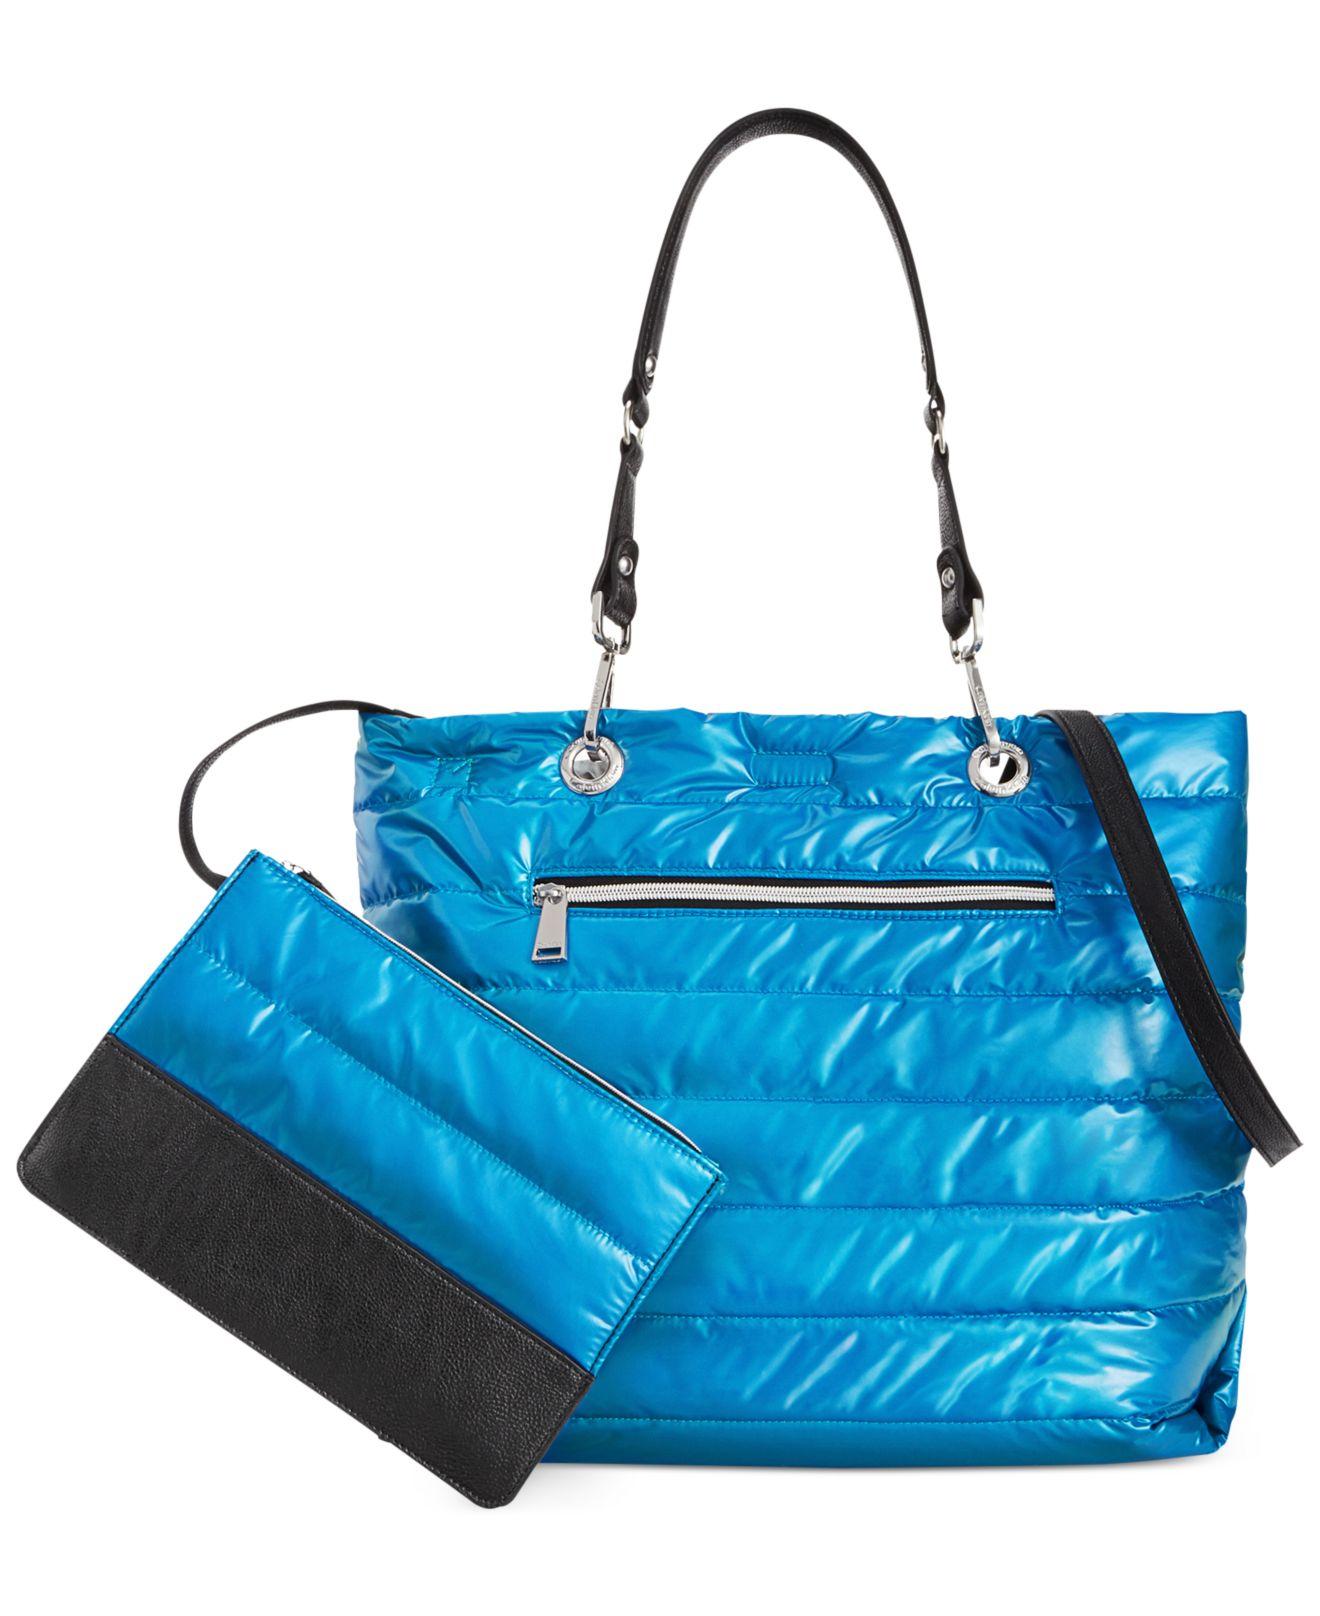 Calvin Klein Cire Reversible Extra Large Nylon Chain Tote